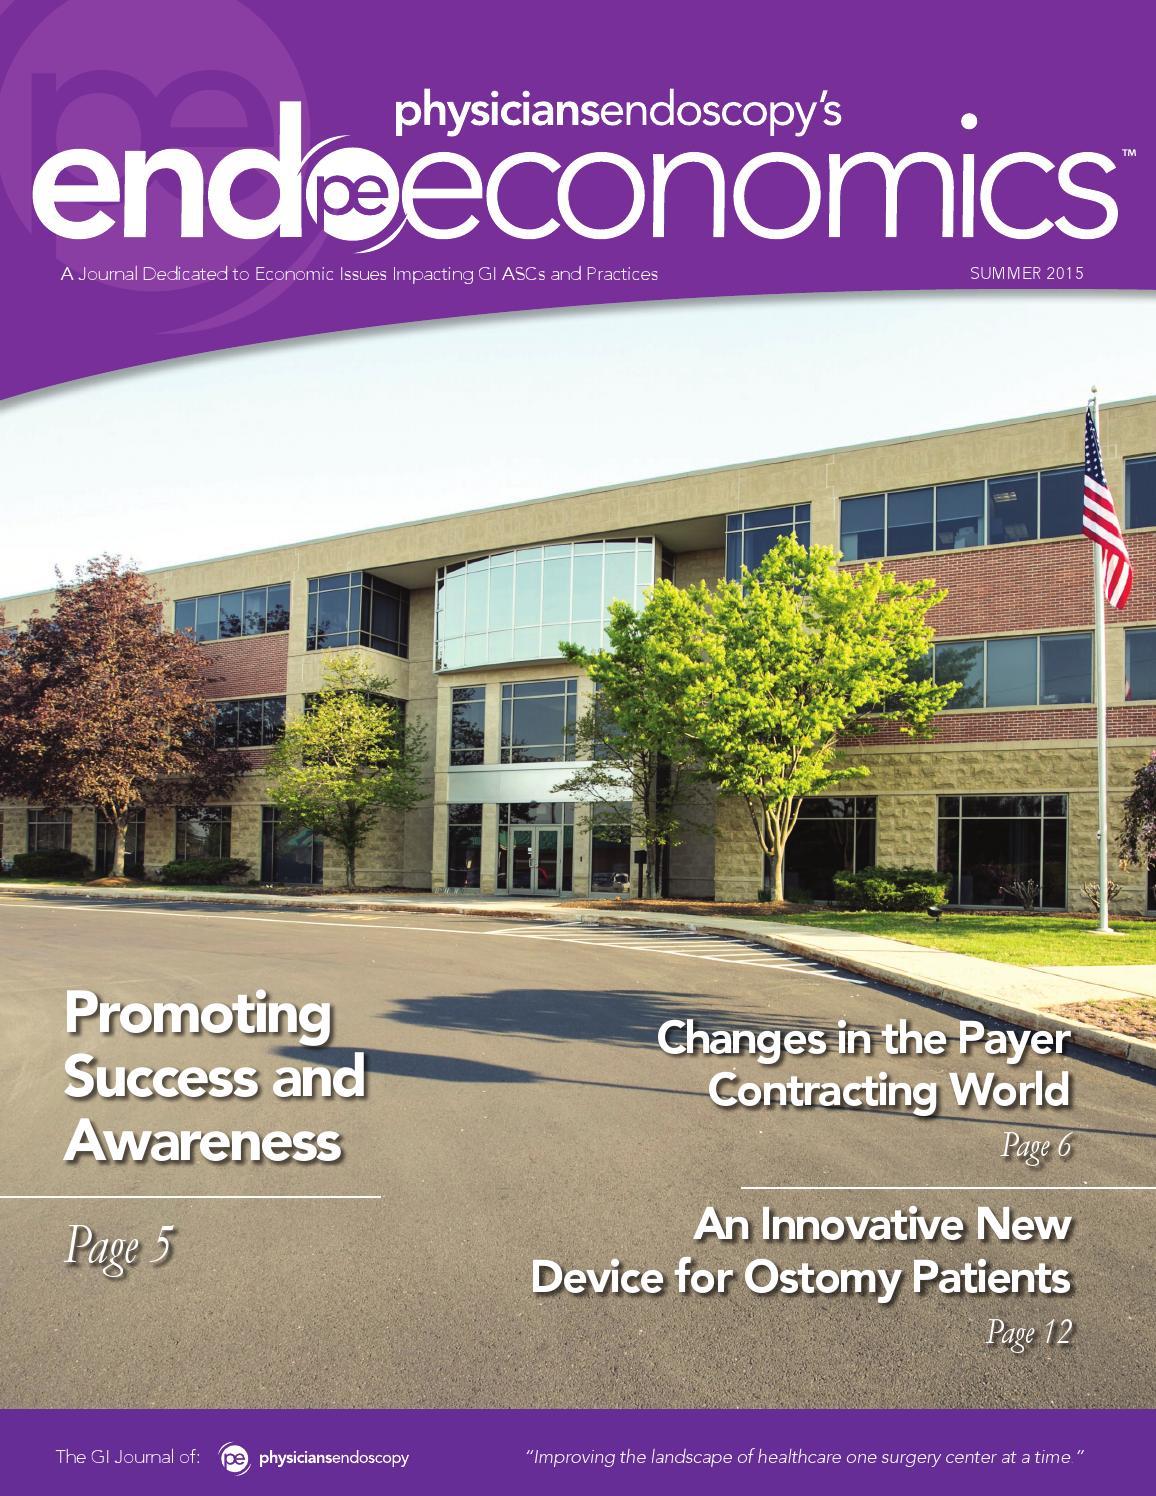 Endoscopy Suite: EndoEconomics Summer 2015 By Physicians Endoscopy, LLC